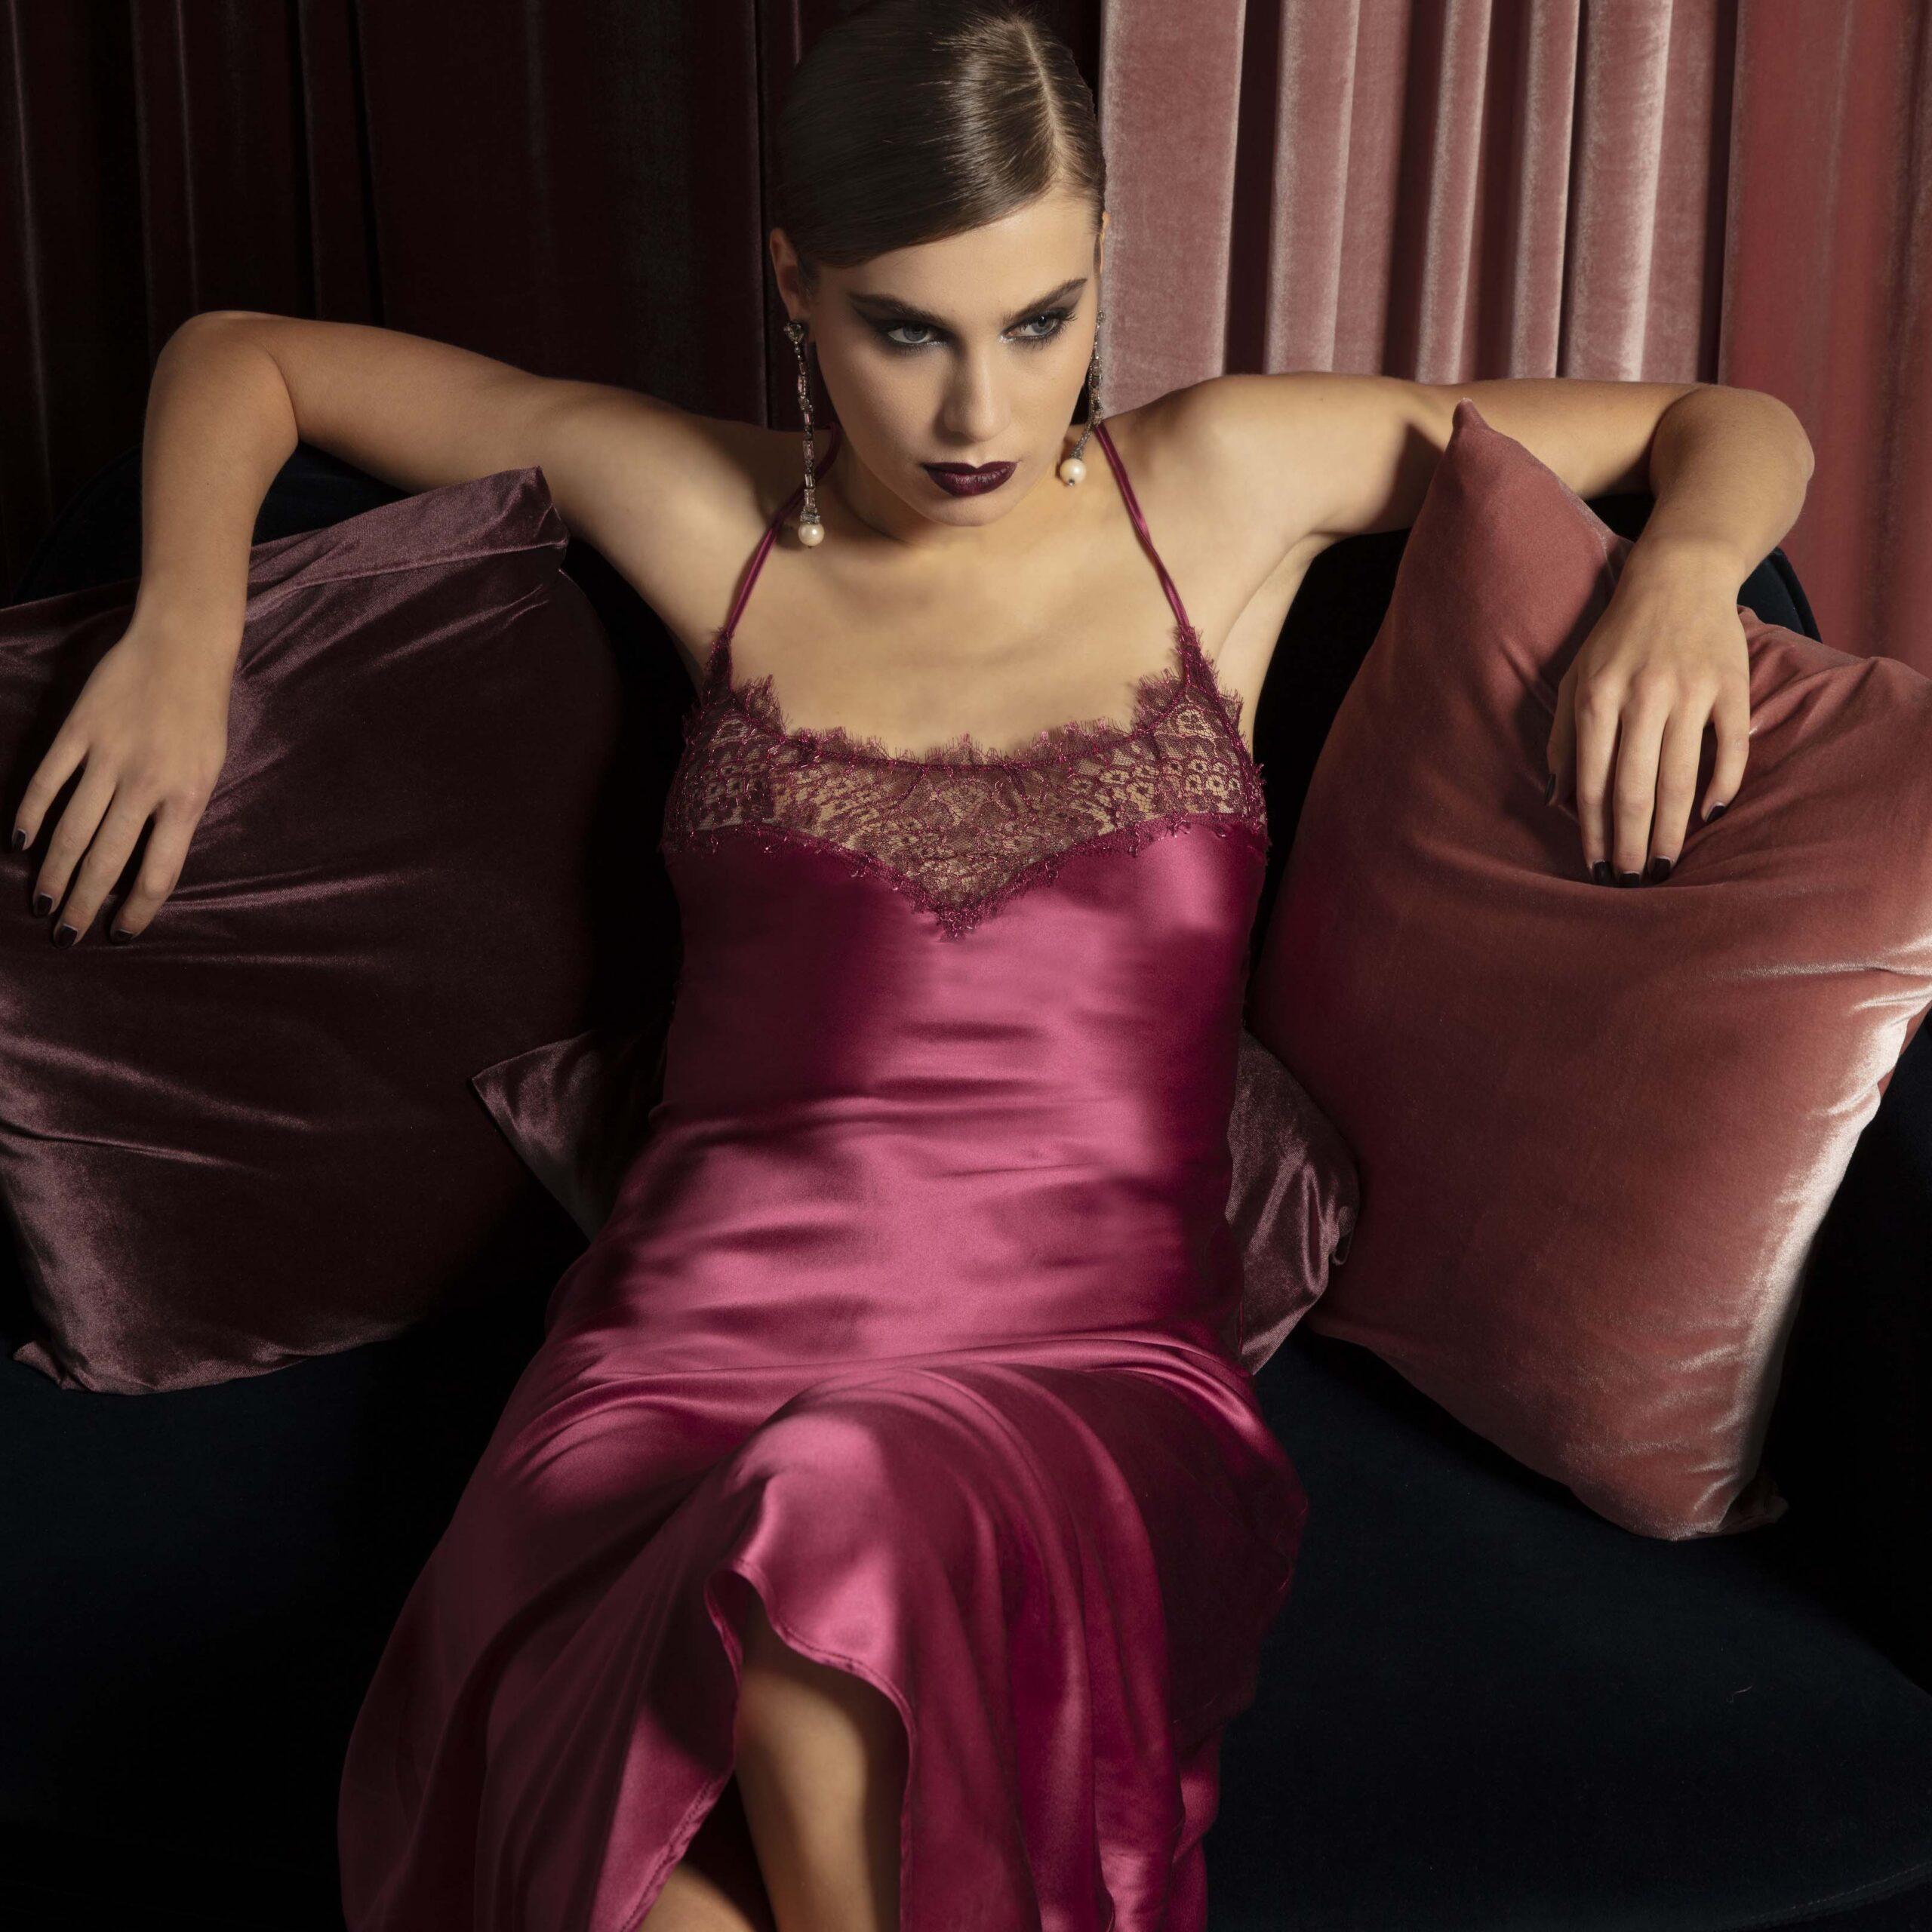 sottoveste-bordeaux-valery-prestige-lingerie-donna-autunno-inverno-2022